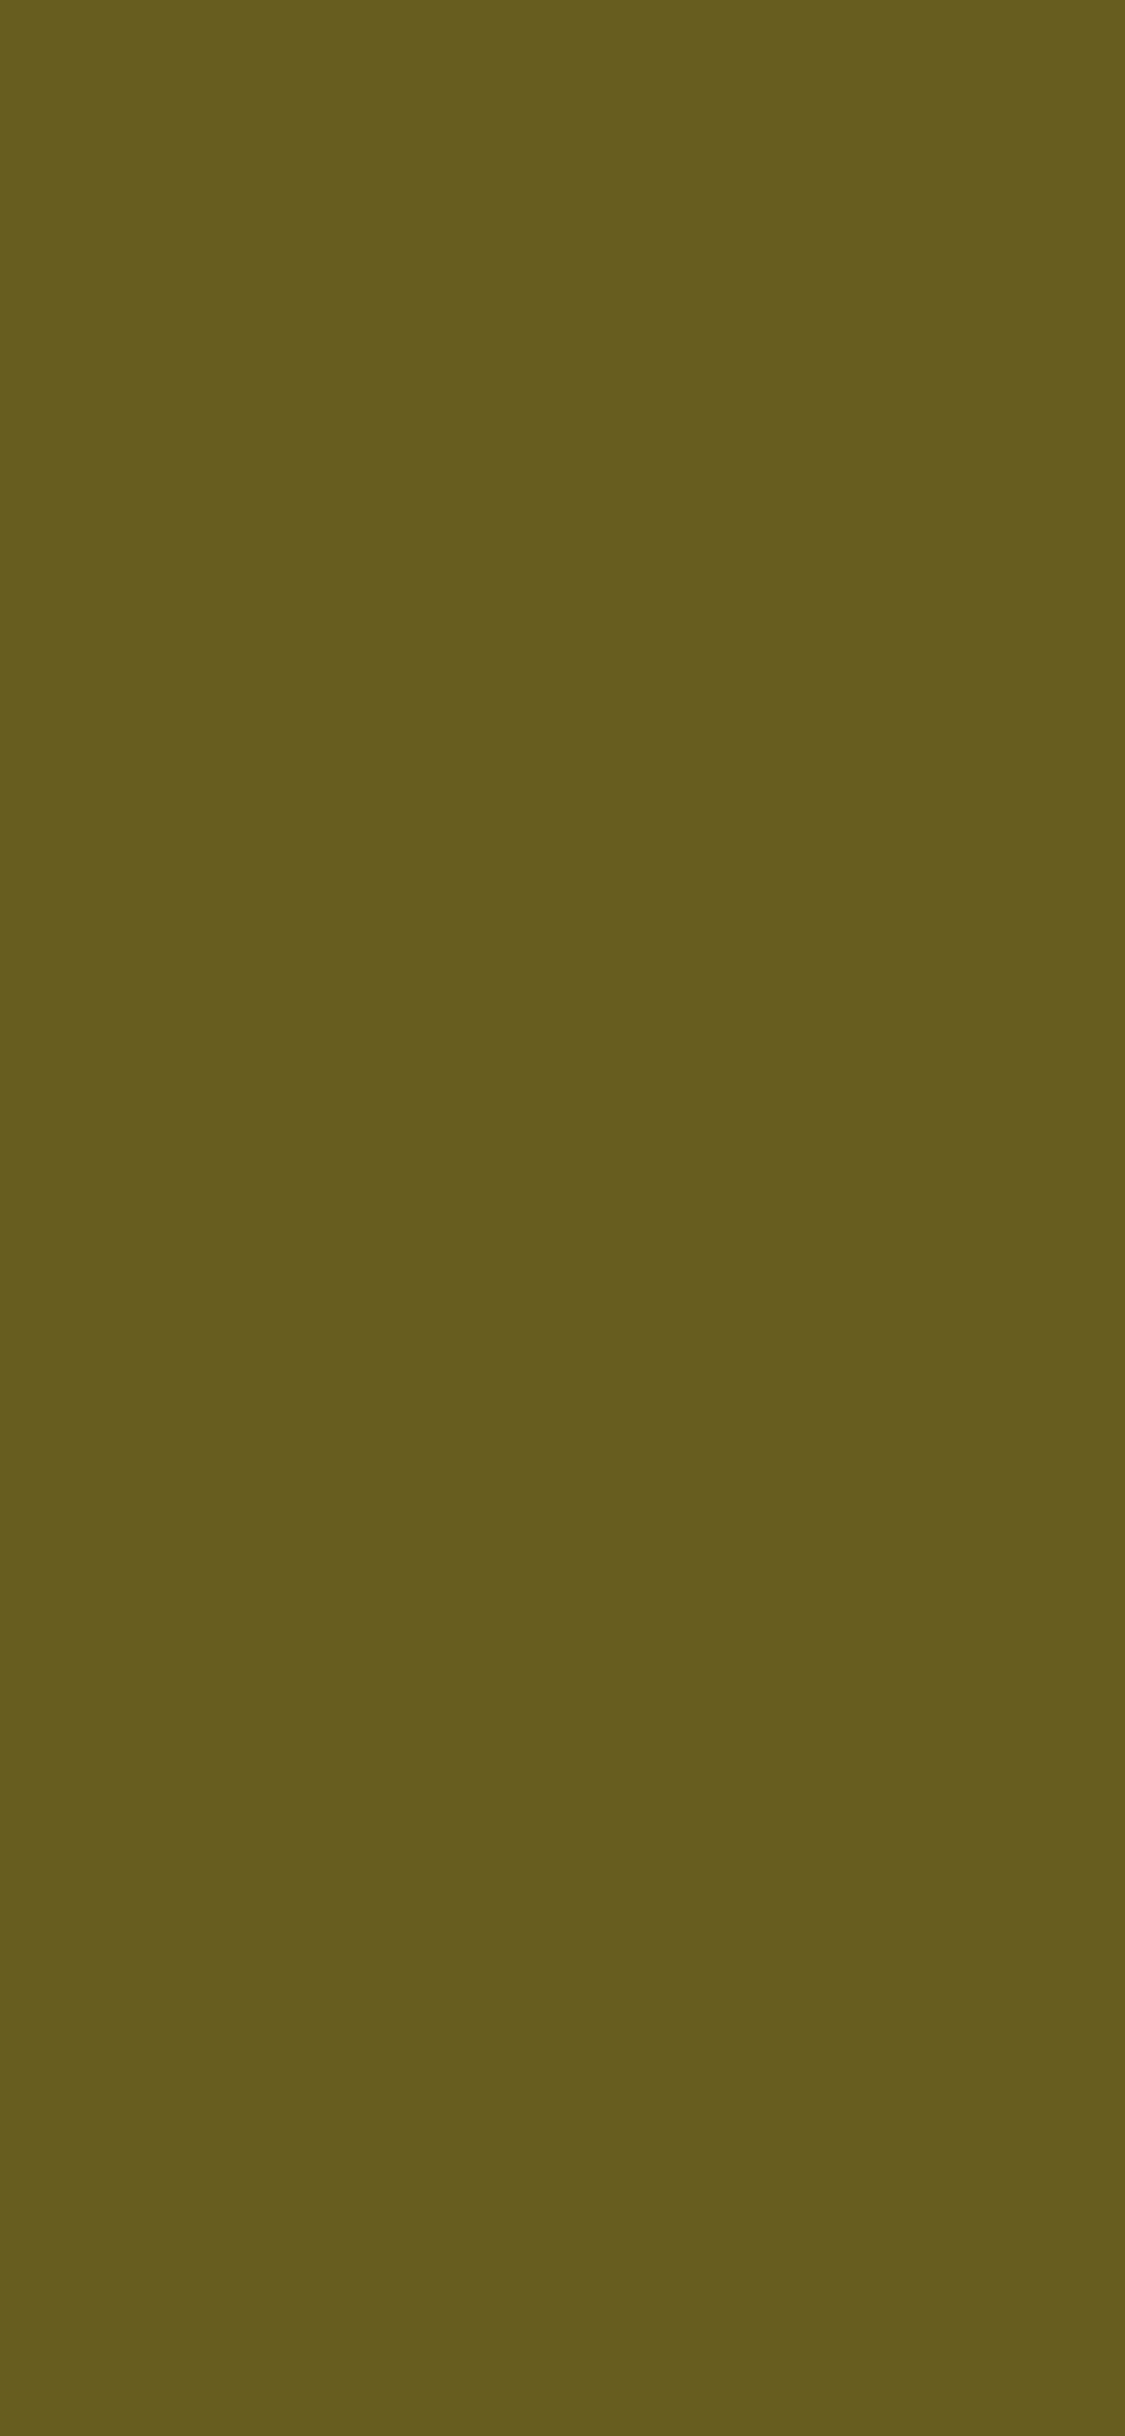 1125x2436 Antique Bronze Solid Color Background